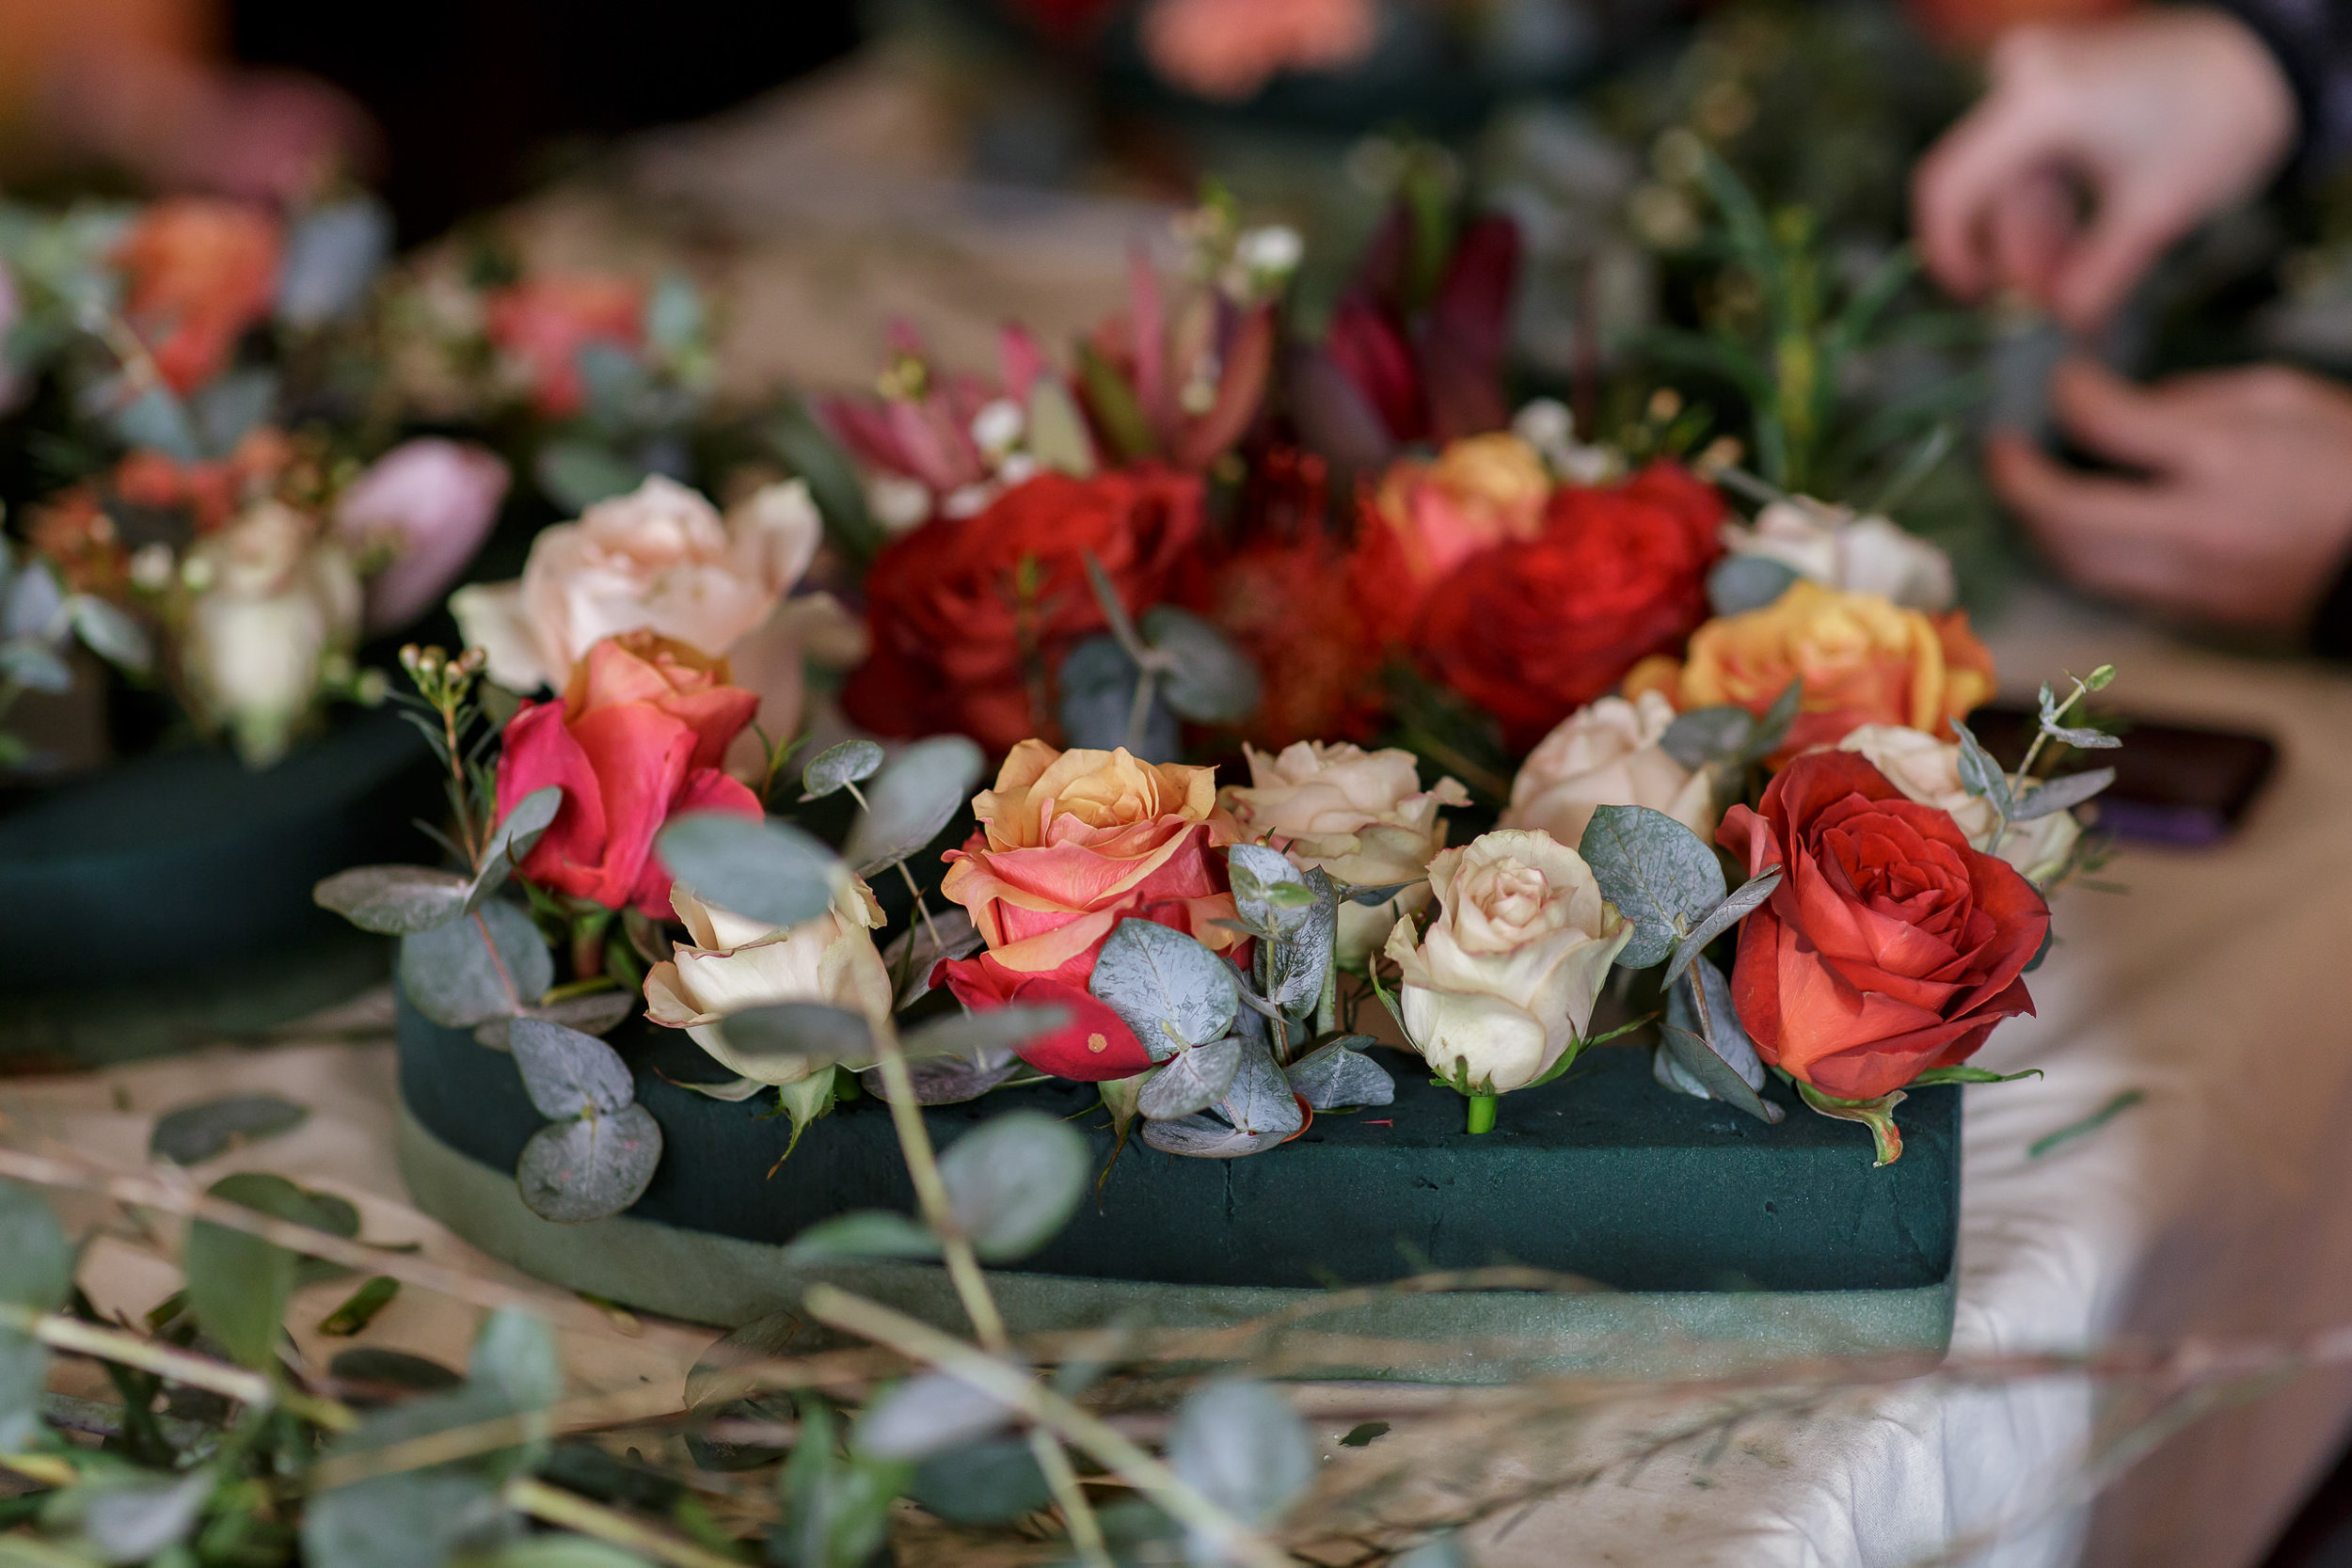 Bilen-Floral-Workshop-58.jpg